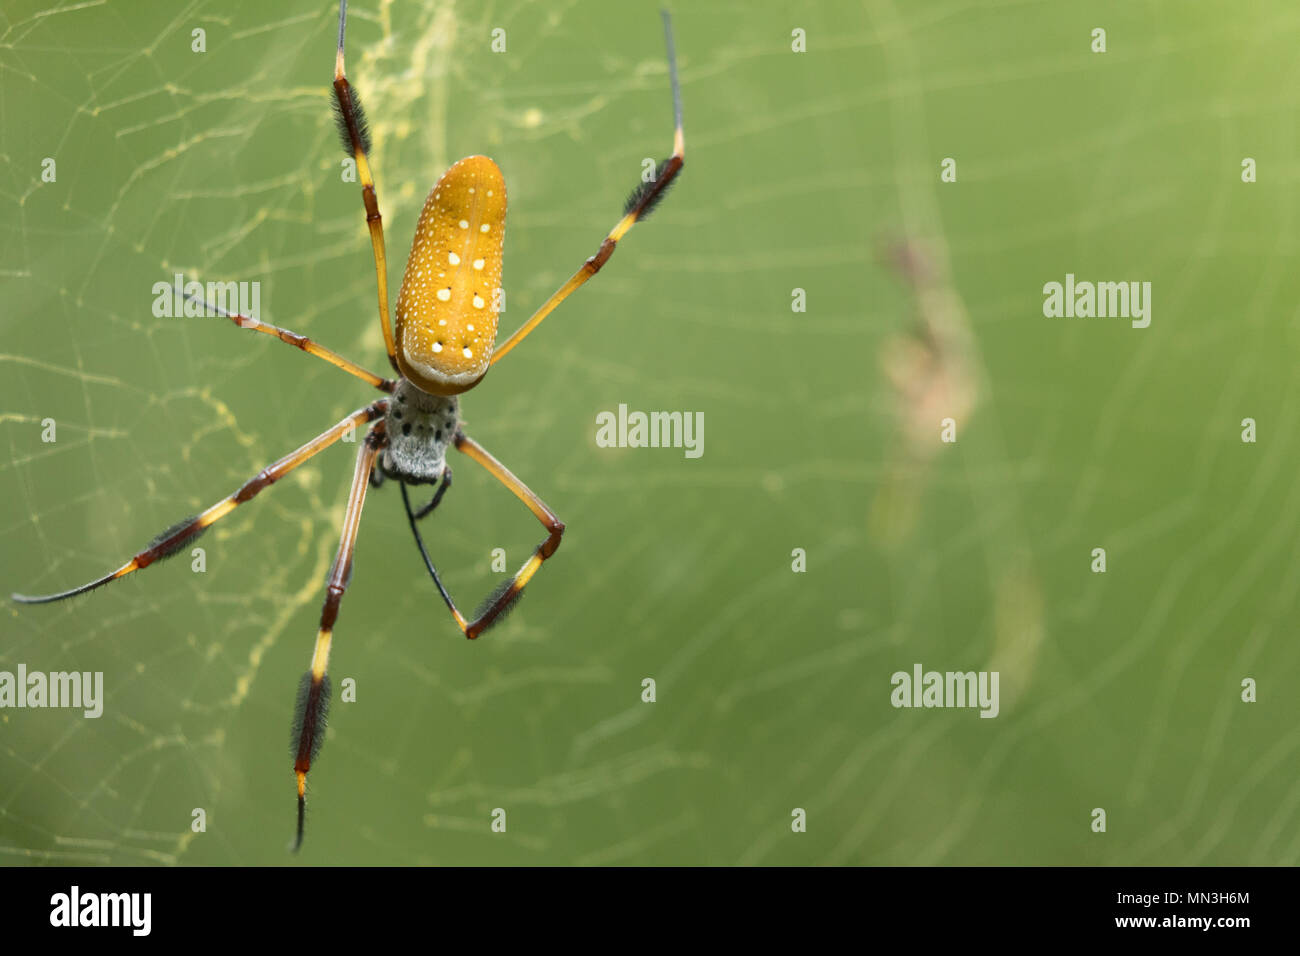 A spider in the jungle, Quebrada Valencia, Magdalena, Colombia, South America - Stock Image